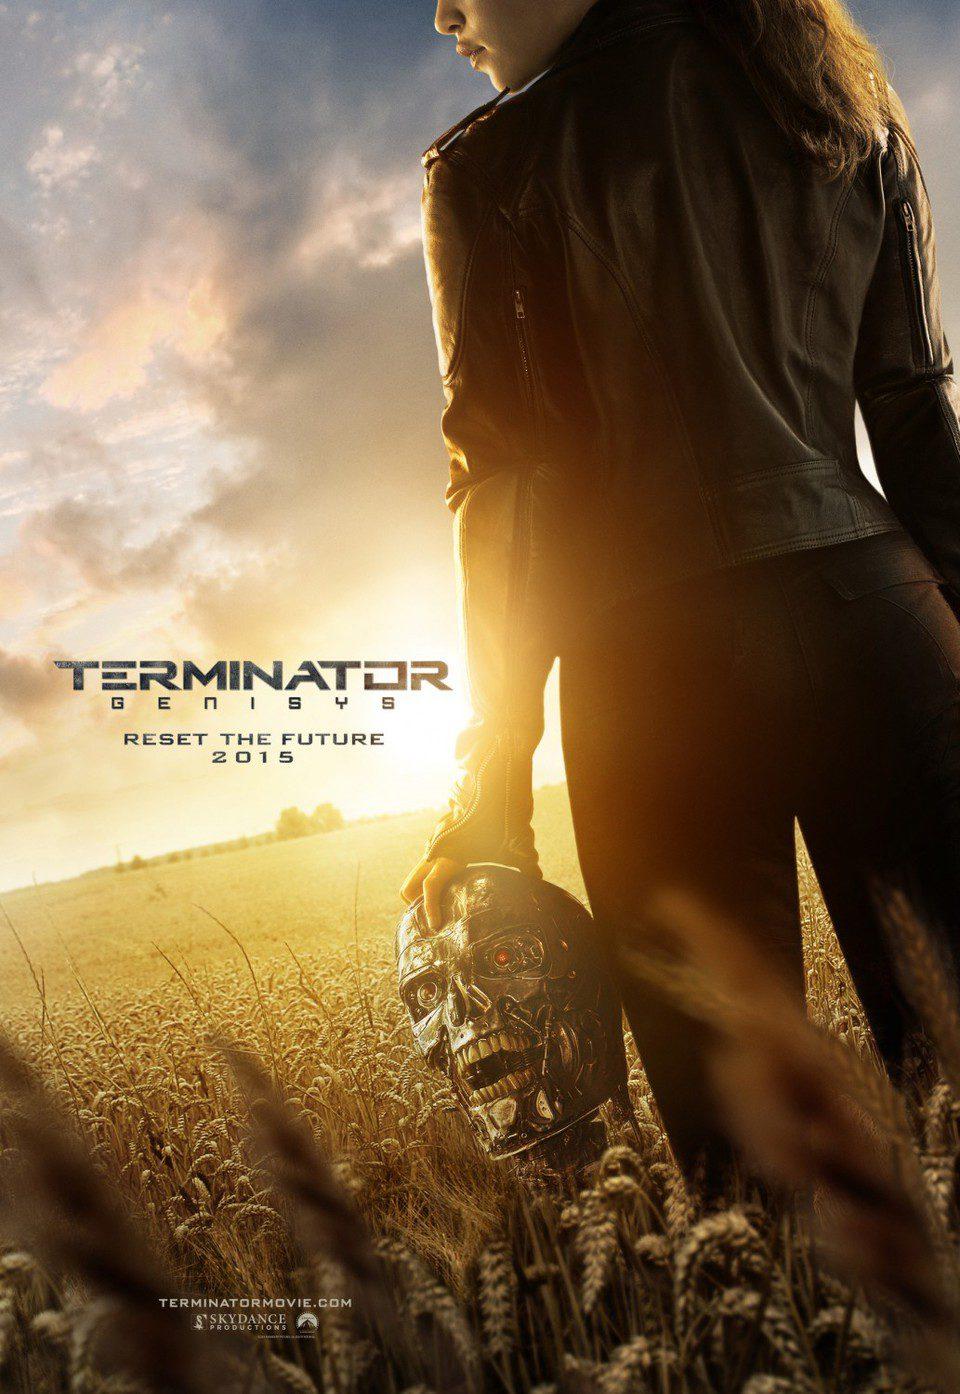 EEUU poster for Terminator Genisys